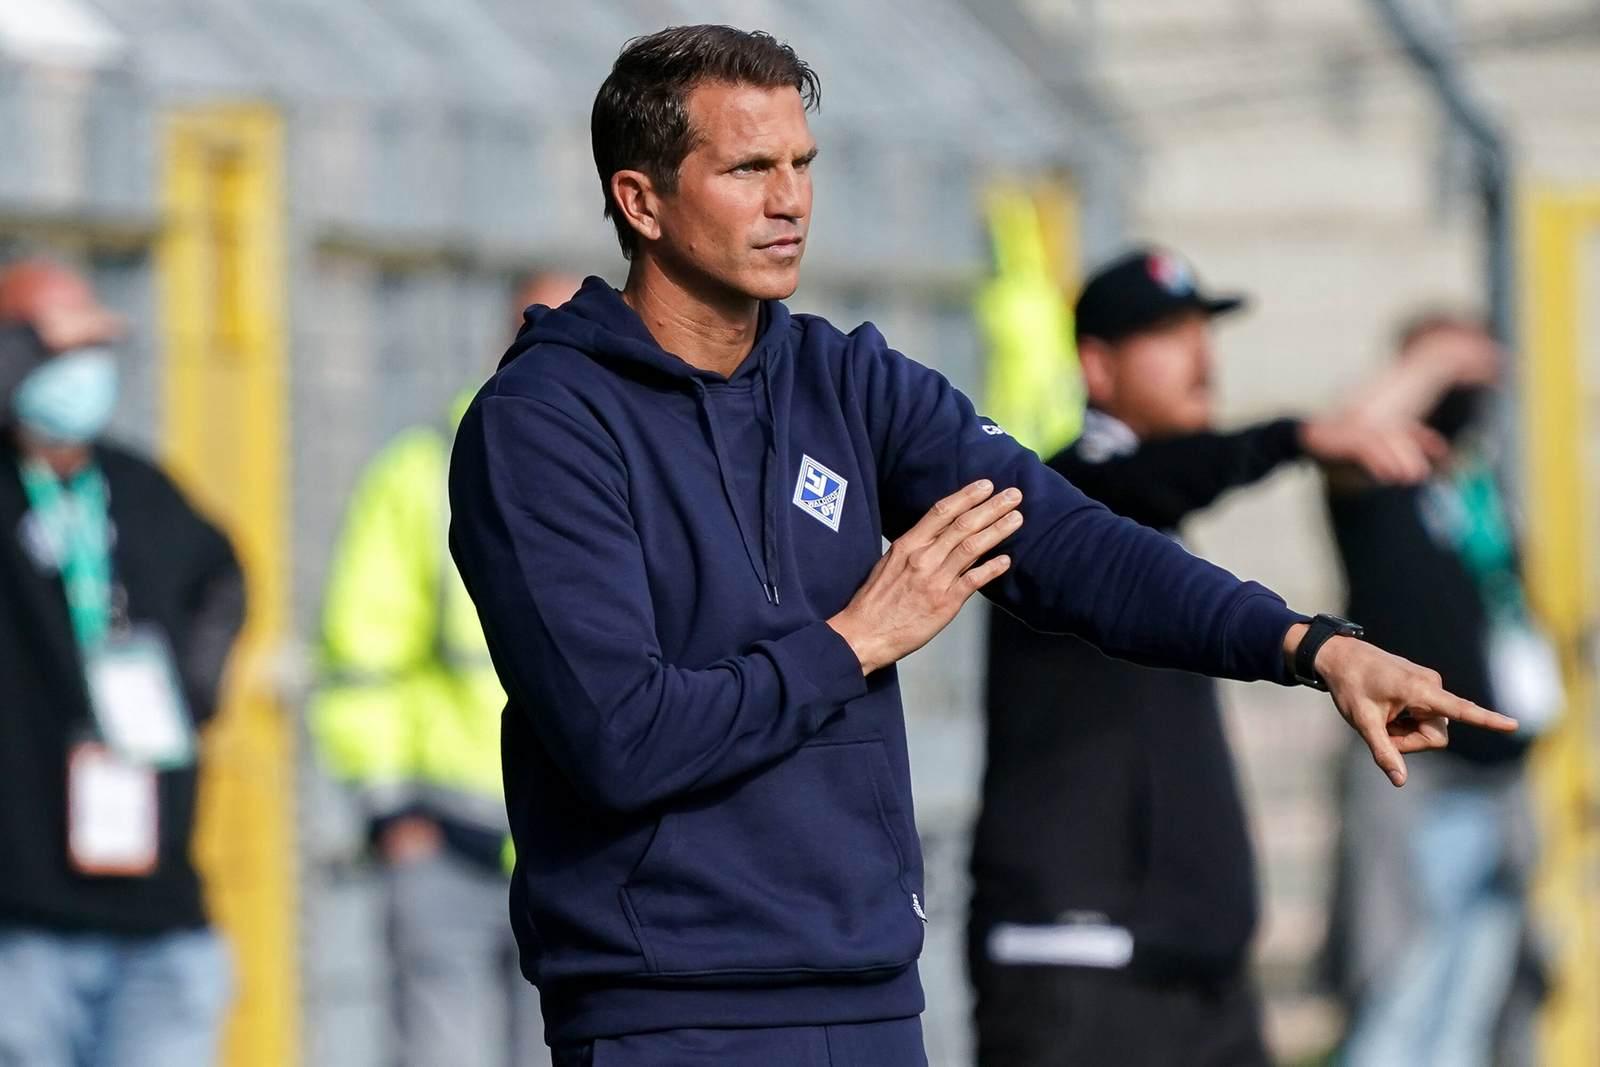 Waldhof Mannheims Trainer Patrick Glöckner